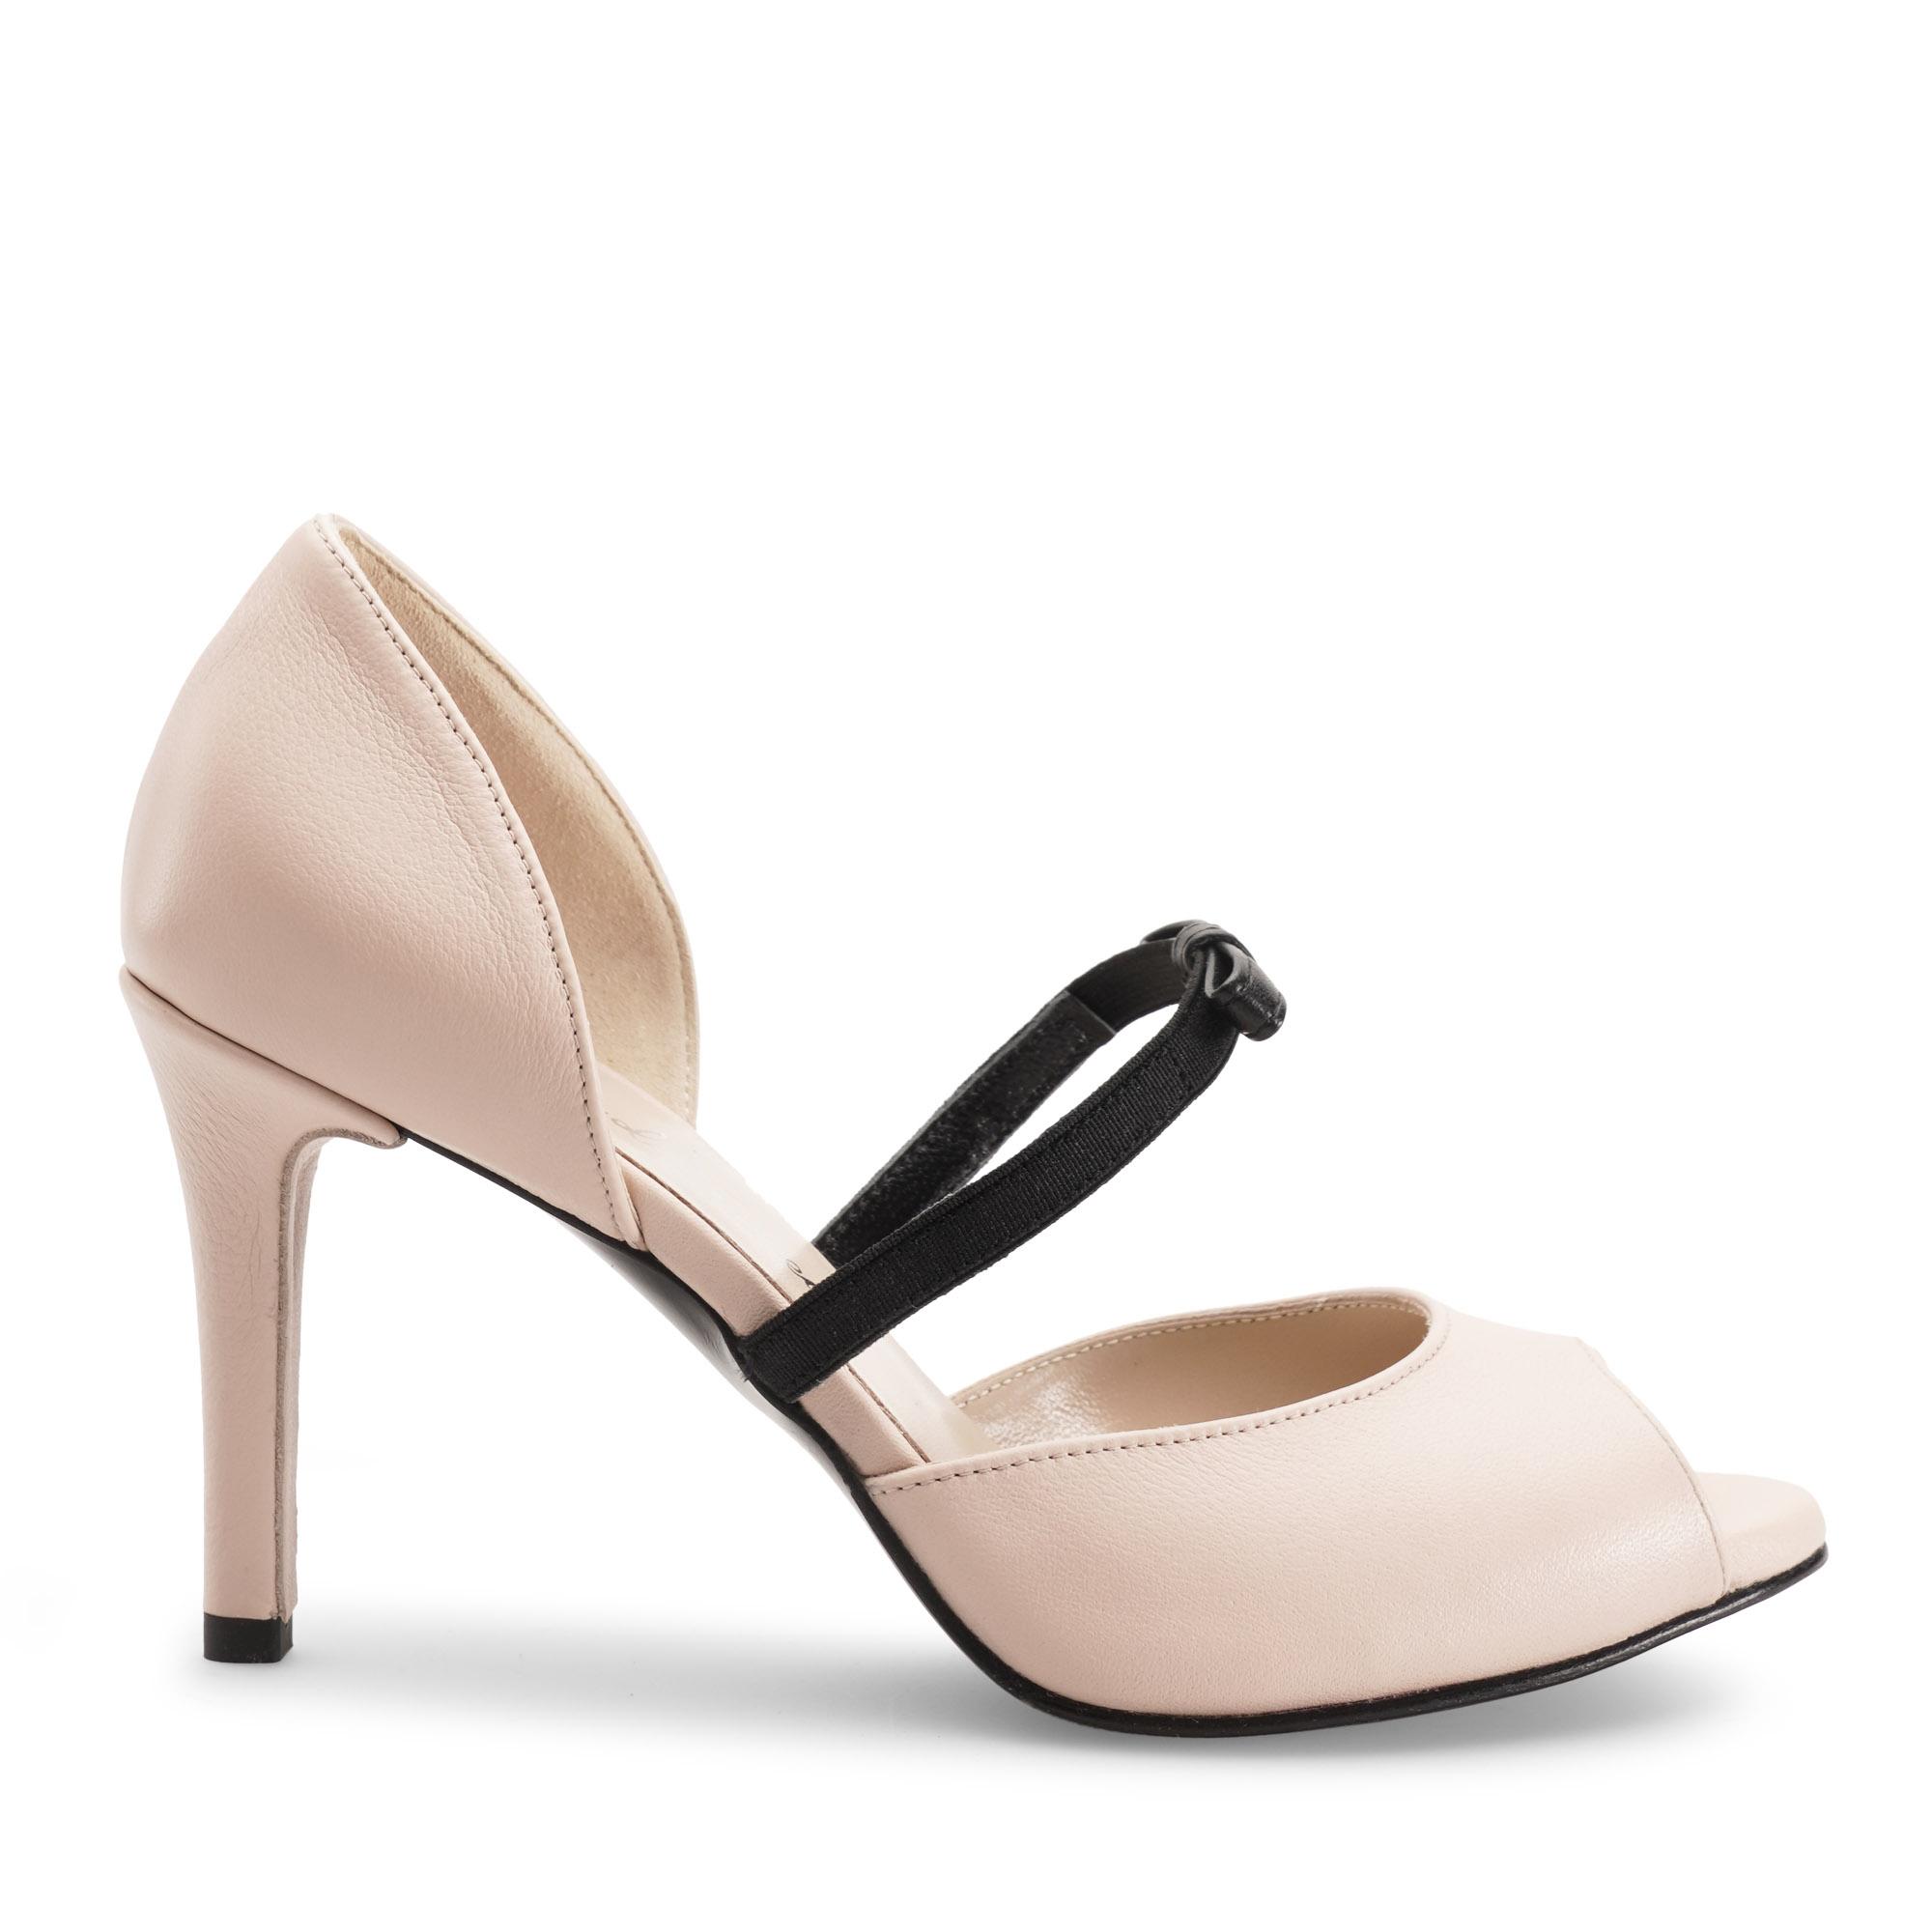 sandalo-spuntata-decollete-donna-pelle-nude-fiocco-nero-emanuela-passeri-shoes-heels-spring-summer-2021